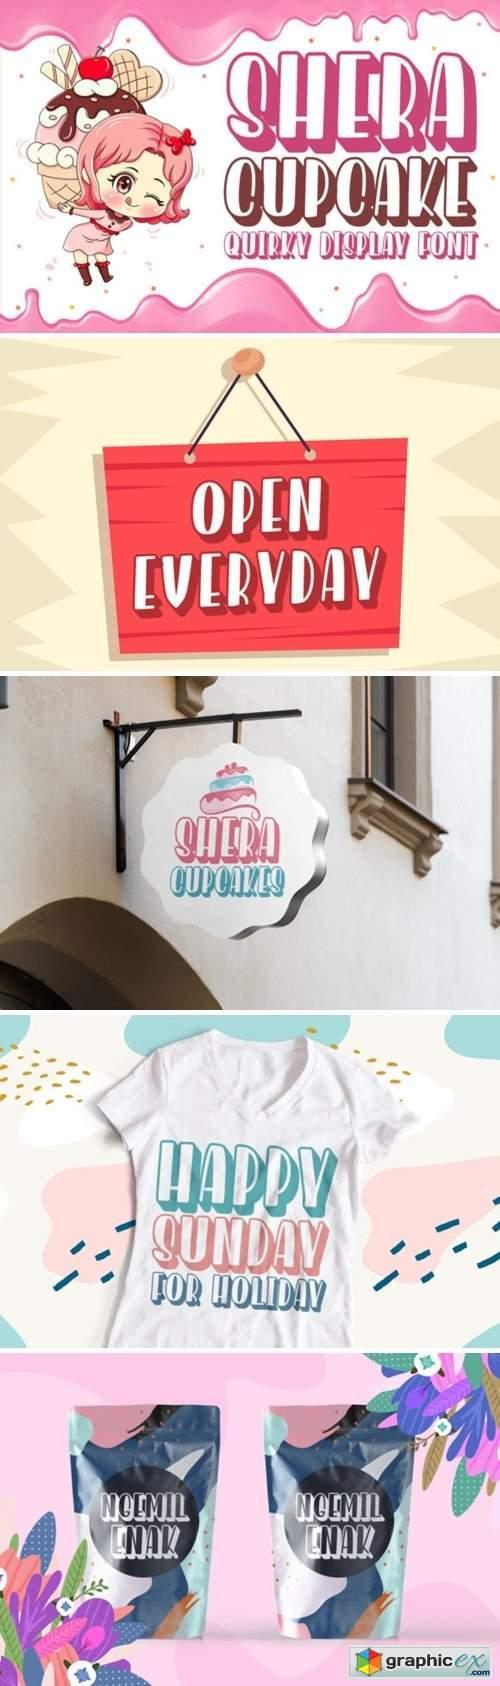 Shera Cupcake Font